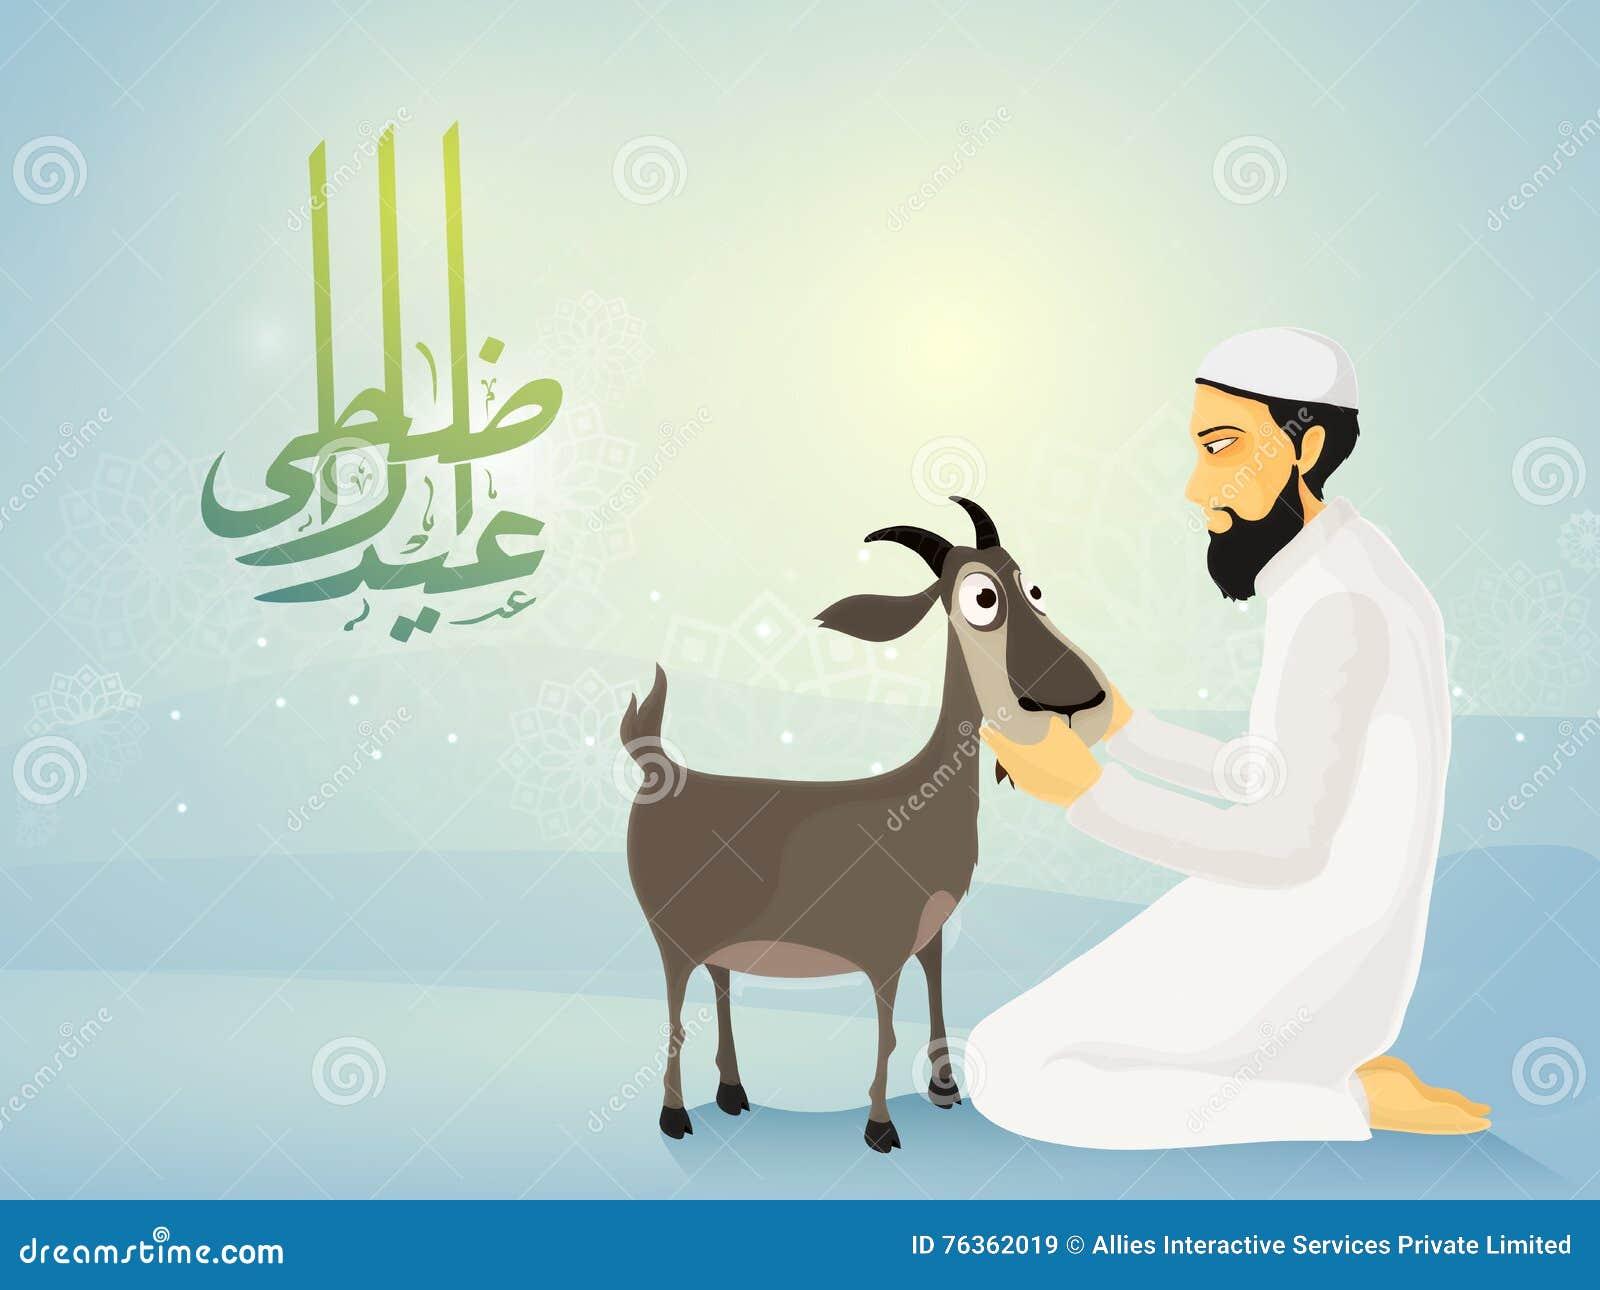 Islamic Man With Goat For Eid-Al-Adha Mubarak  Stock